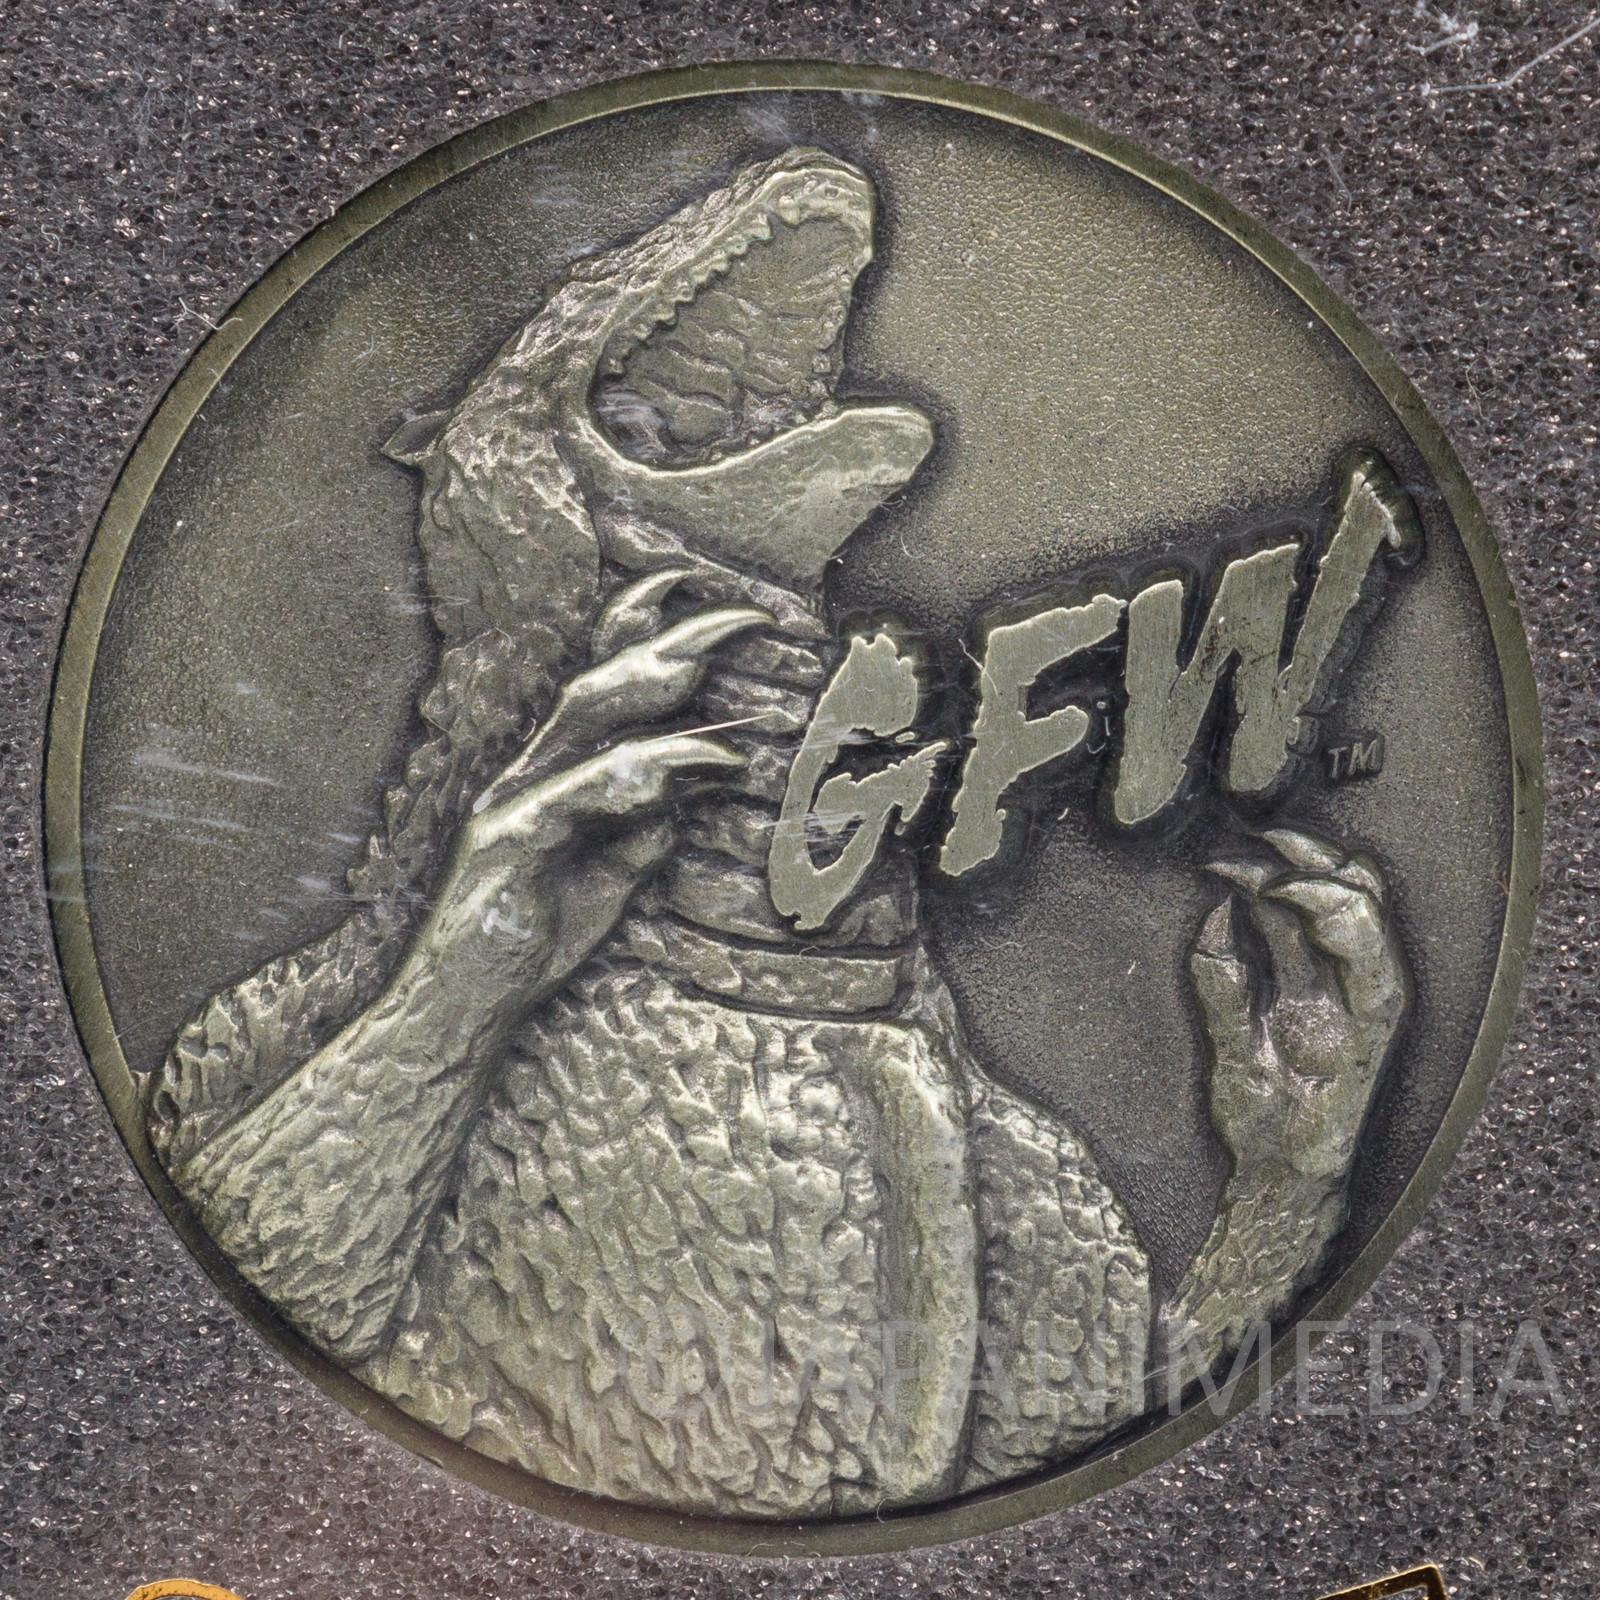 Godzilla Final Wars Movie 2004 Memorial Medal Toho JAPAN TOKUSATSU